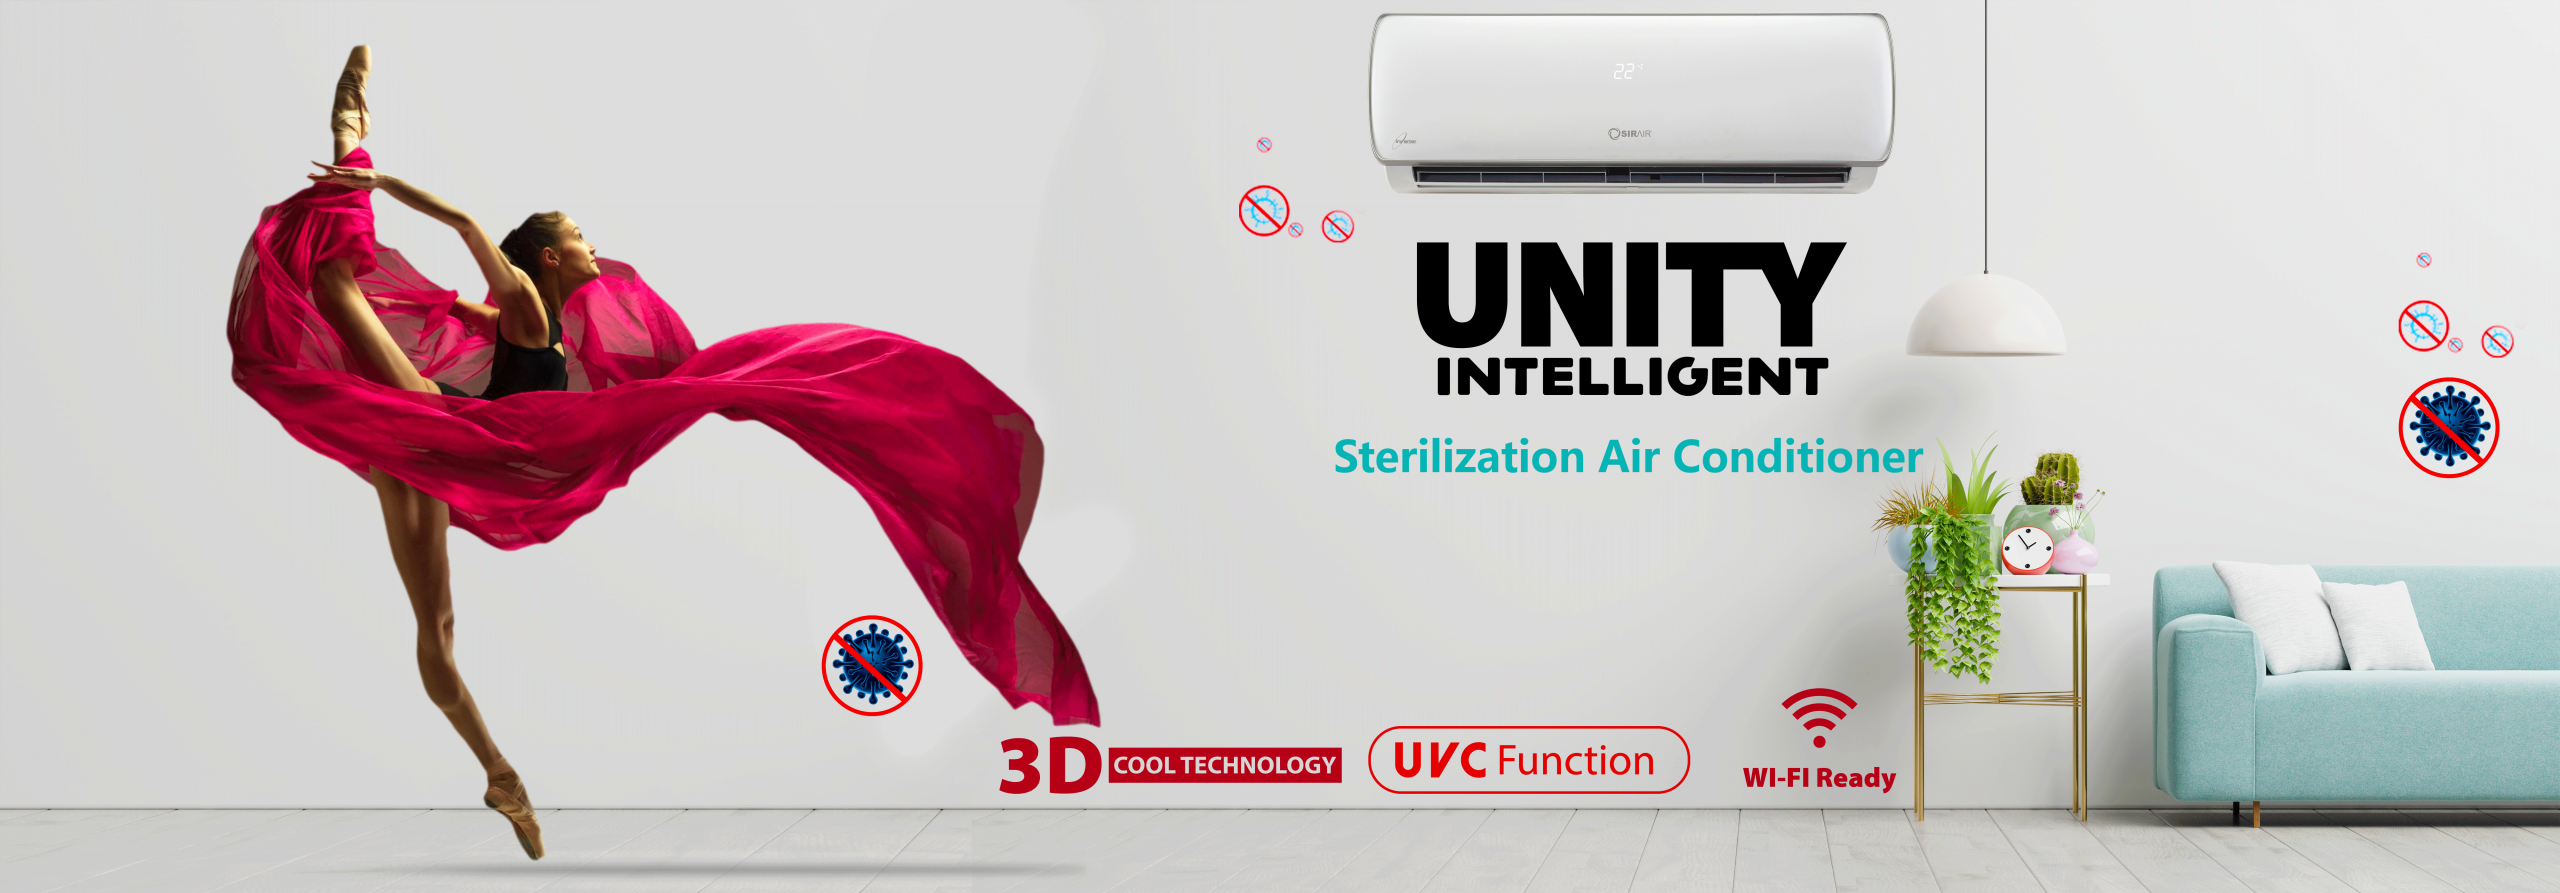 Unity_Intelligent_UVC_